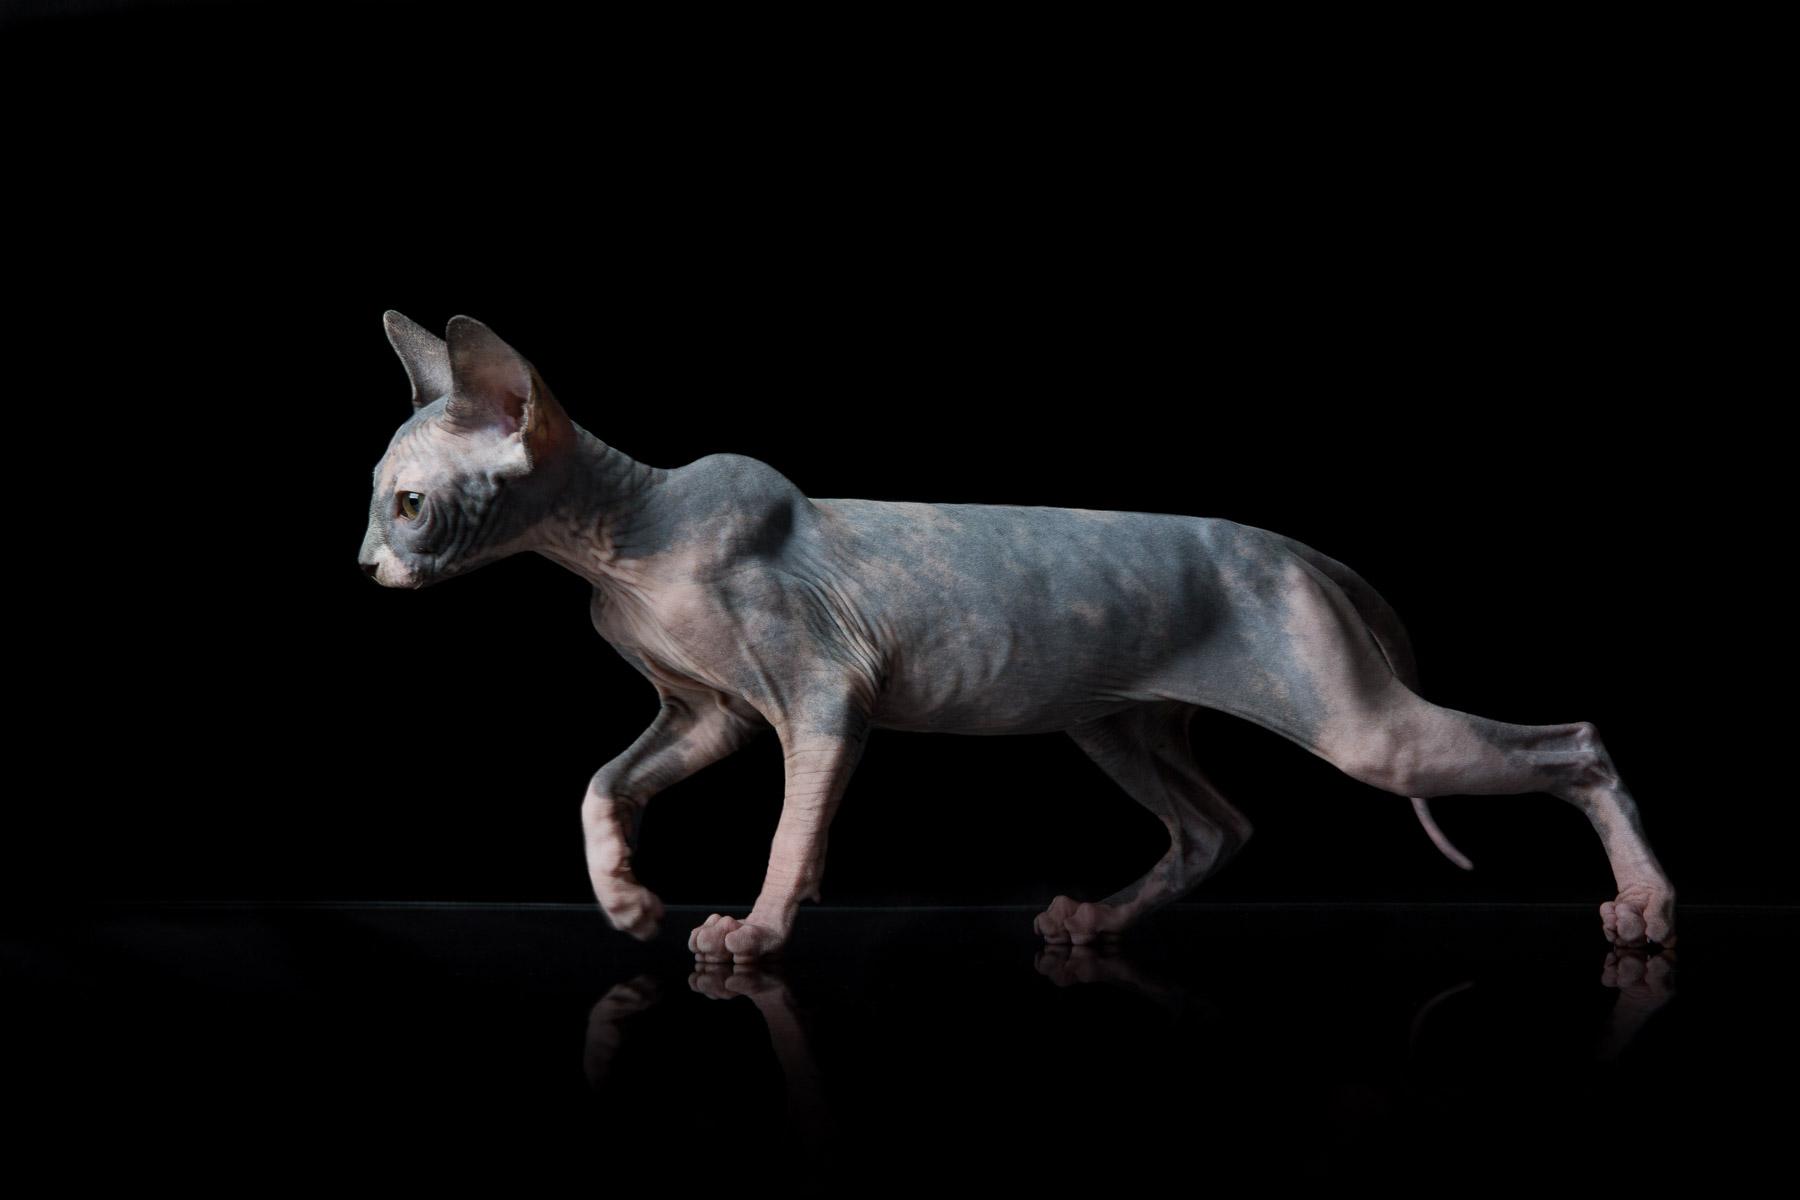 3Sphynx-cat-hairless-cat-photographer-pets-alicia-rius.jpg